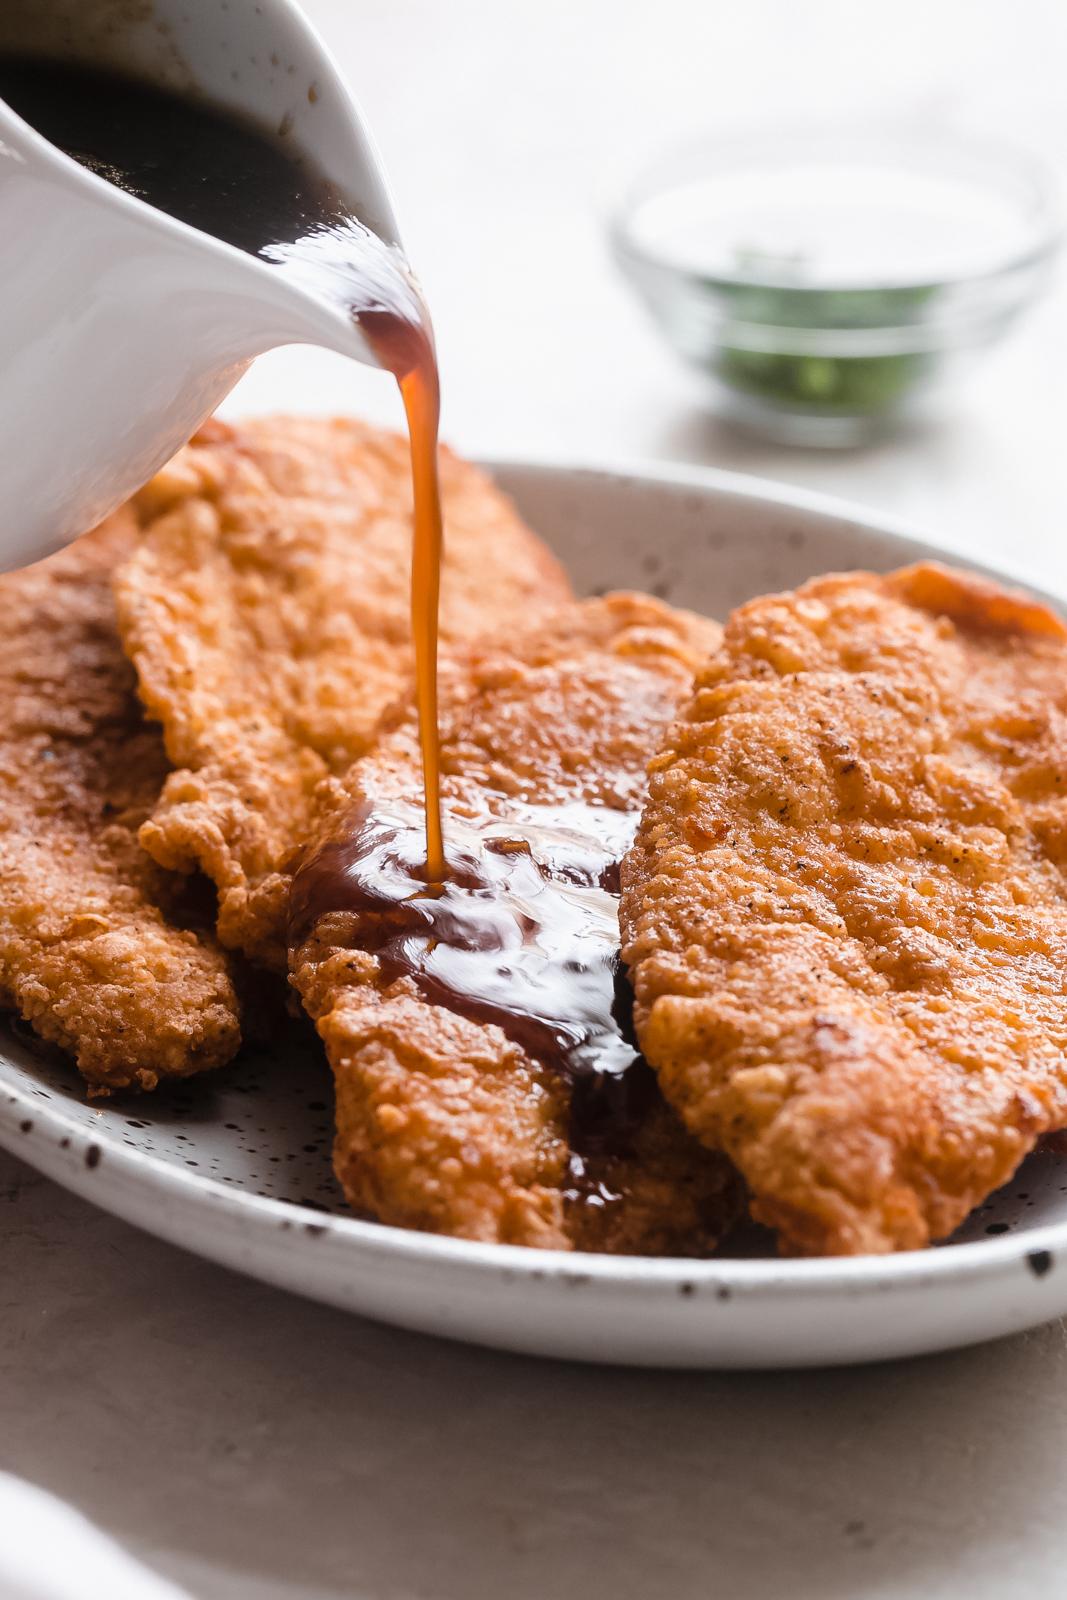 pouring honey garlic sauce over crispy chicken breasts